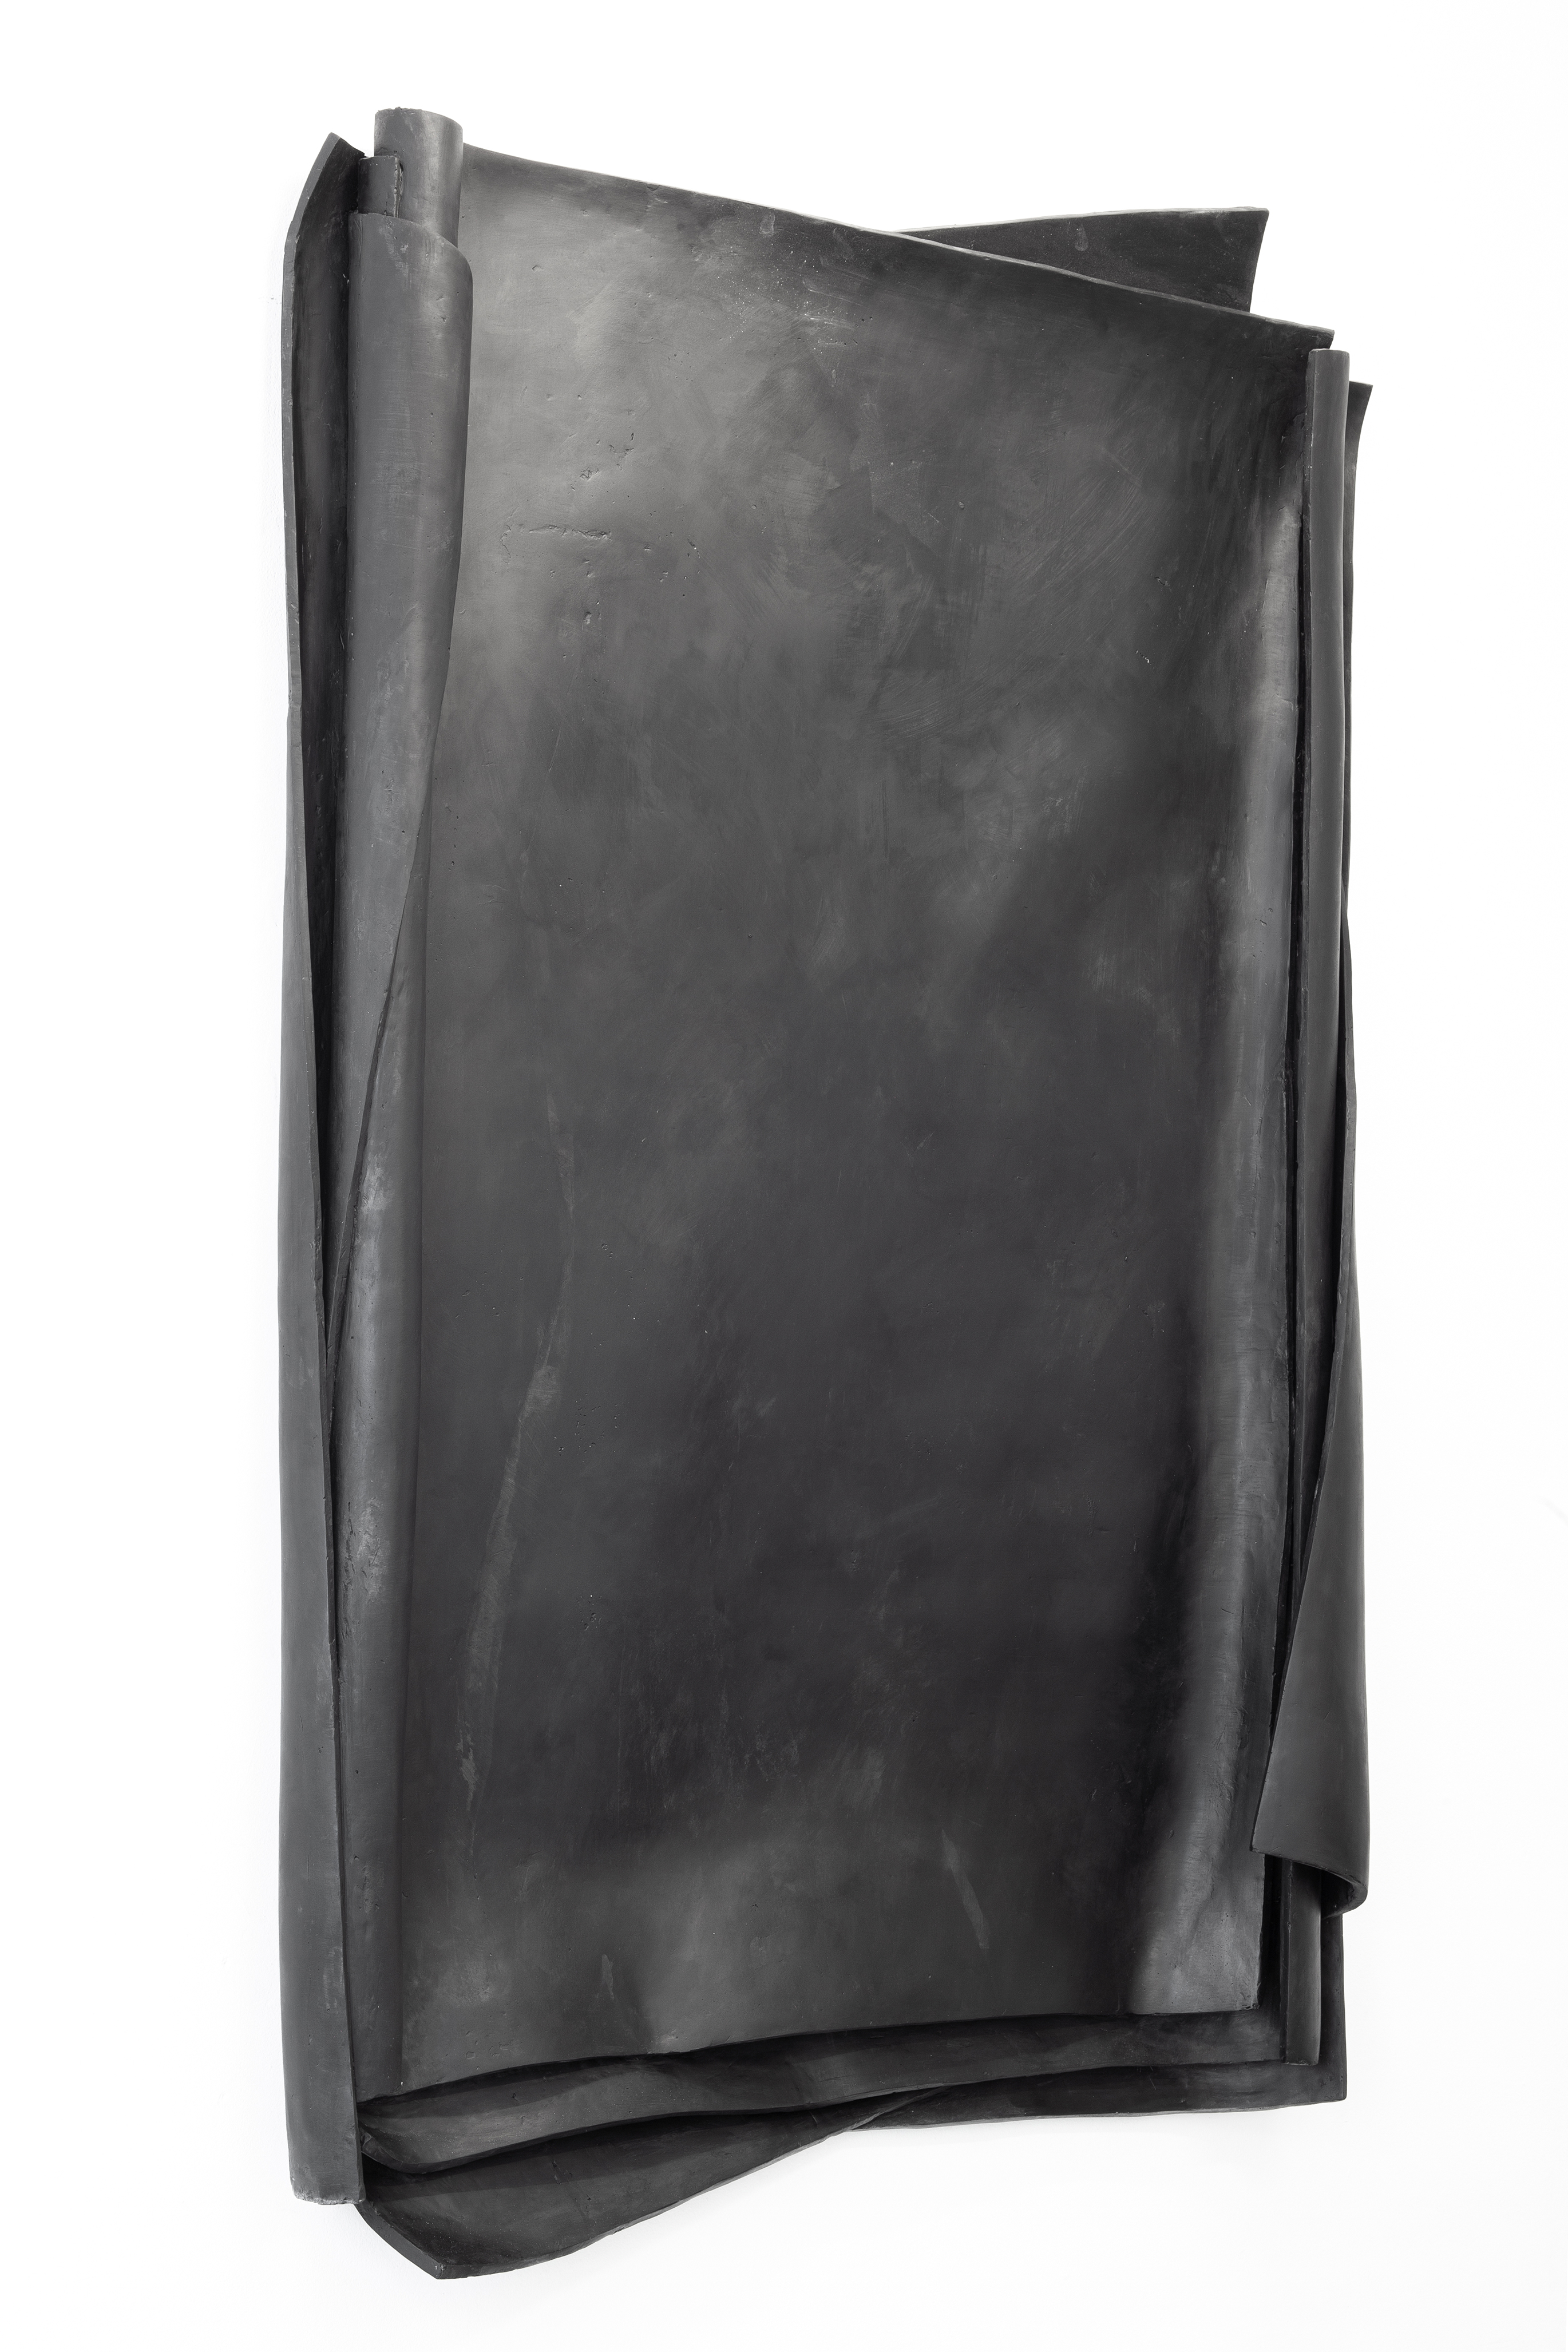 Artwork by Erik Andersen - Besser Vertikal 02, 2021 - Black Skulptur - Relief made of Epoxy Resin - Dimension 240 x 155 x26 cm